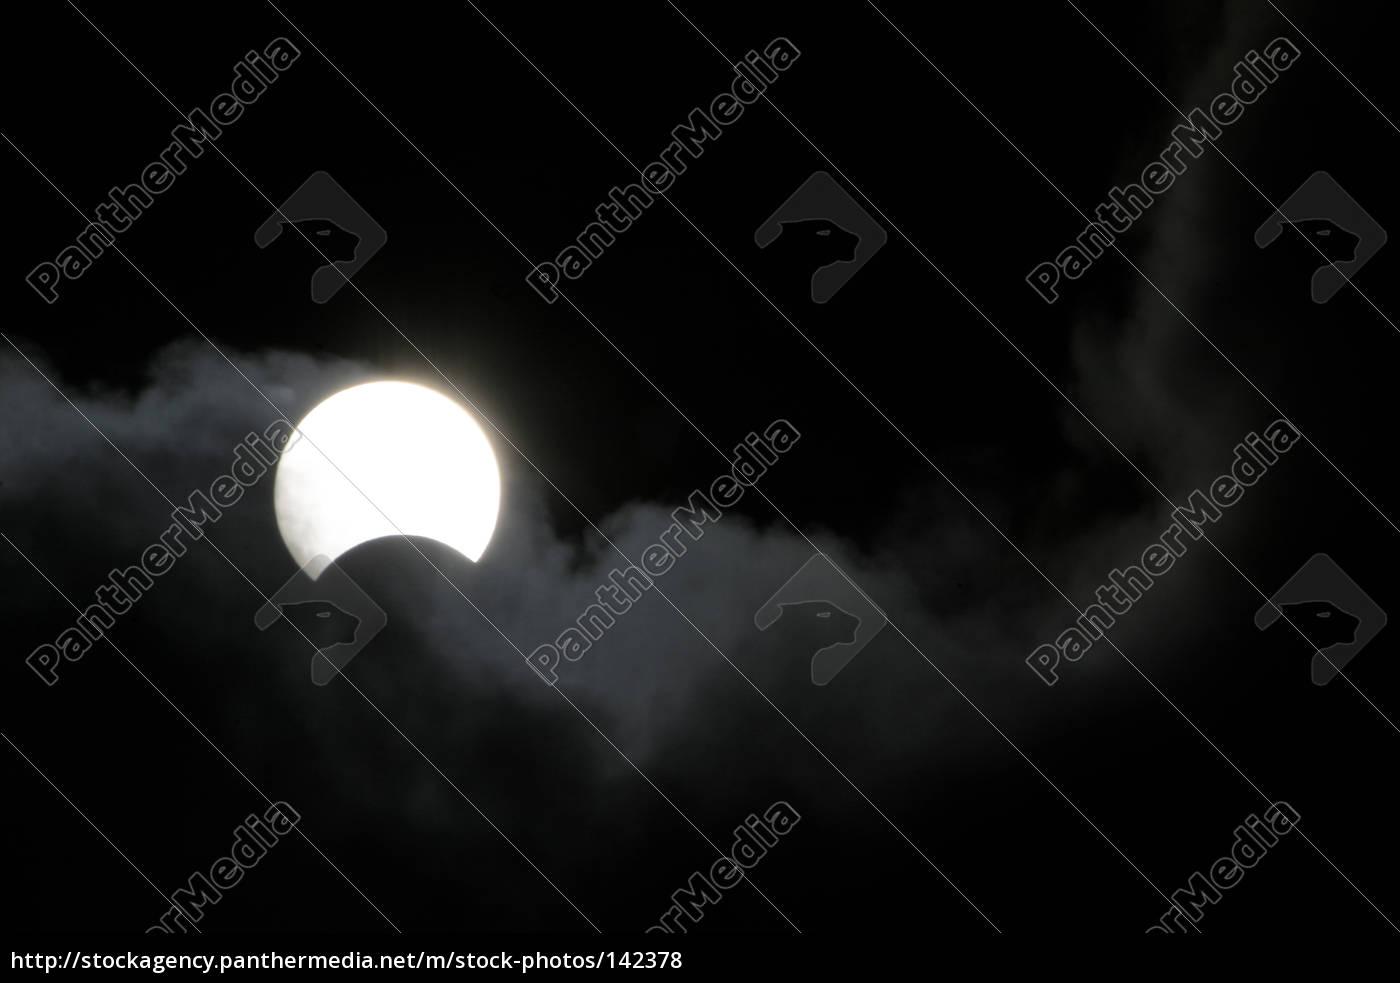 solar, eclipse - 142378